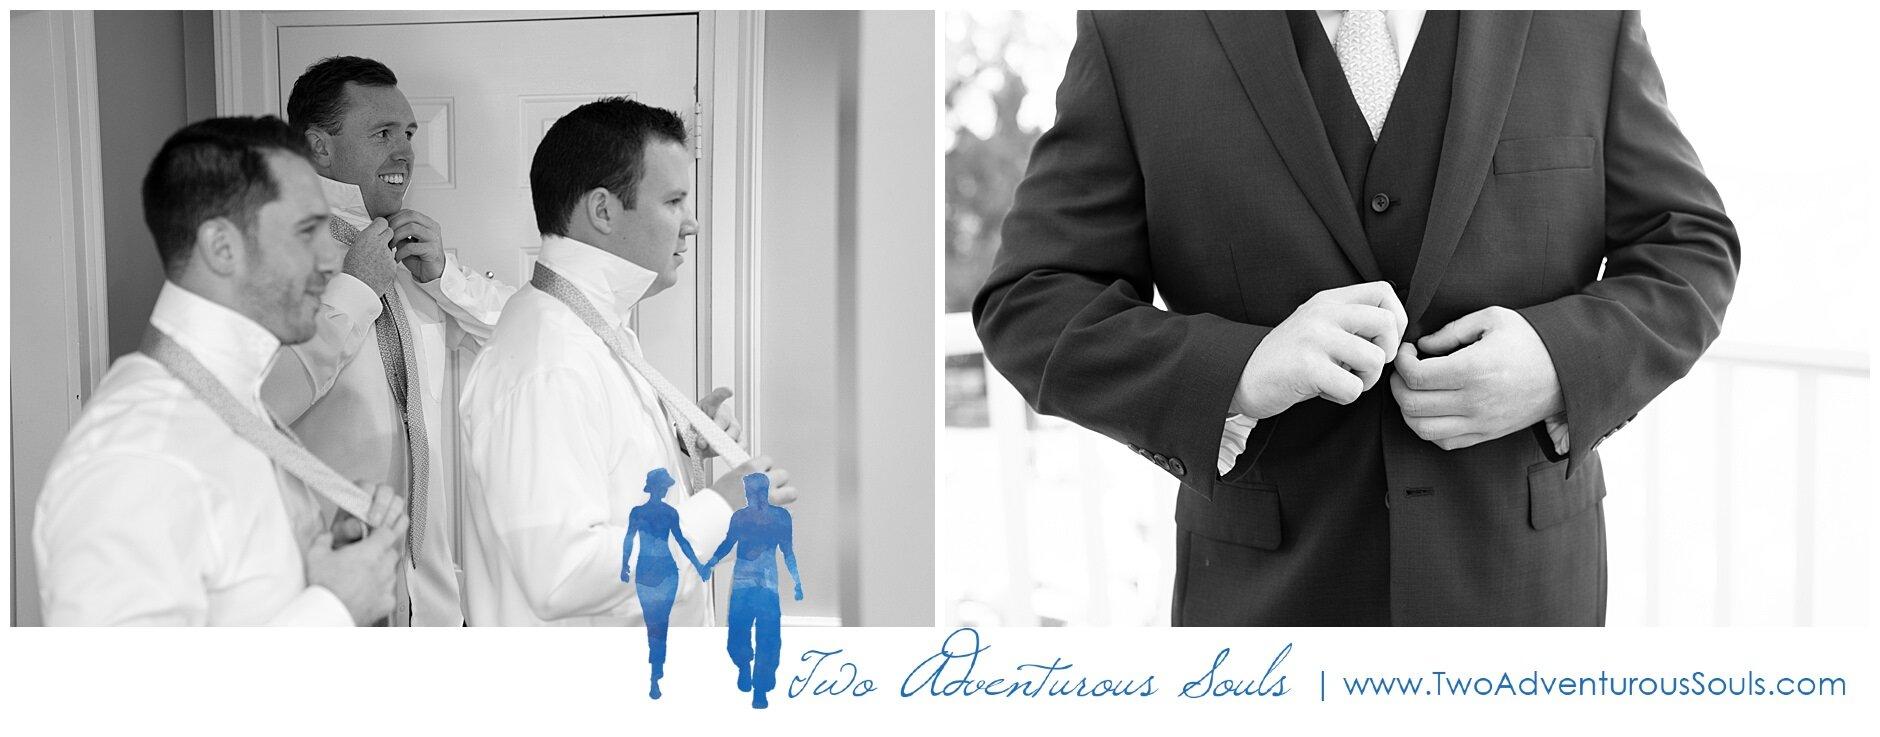 Breakwater Inn and Spa Wedding Photographers, Kennebunkport Wedding Photographers, Two Adventurous Souls- 092119_0006.jpg